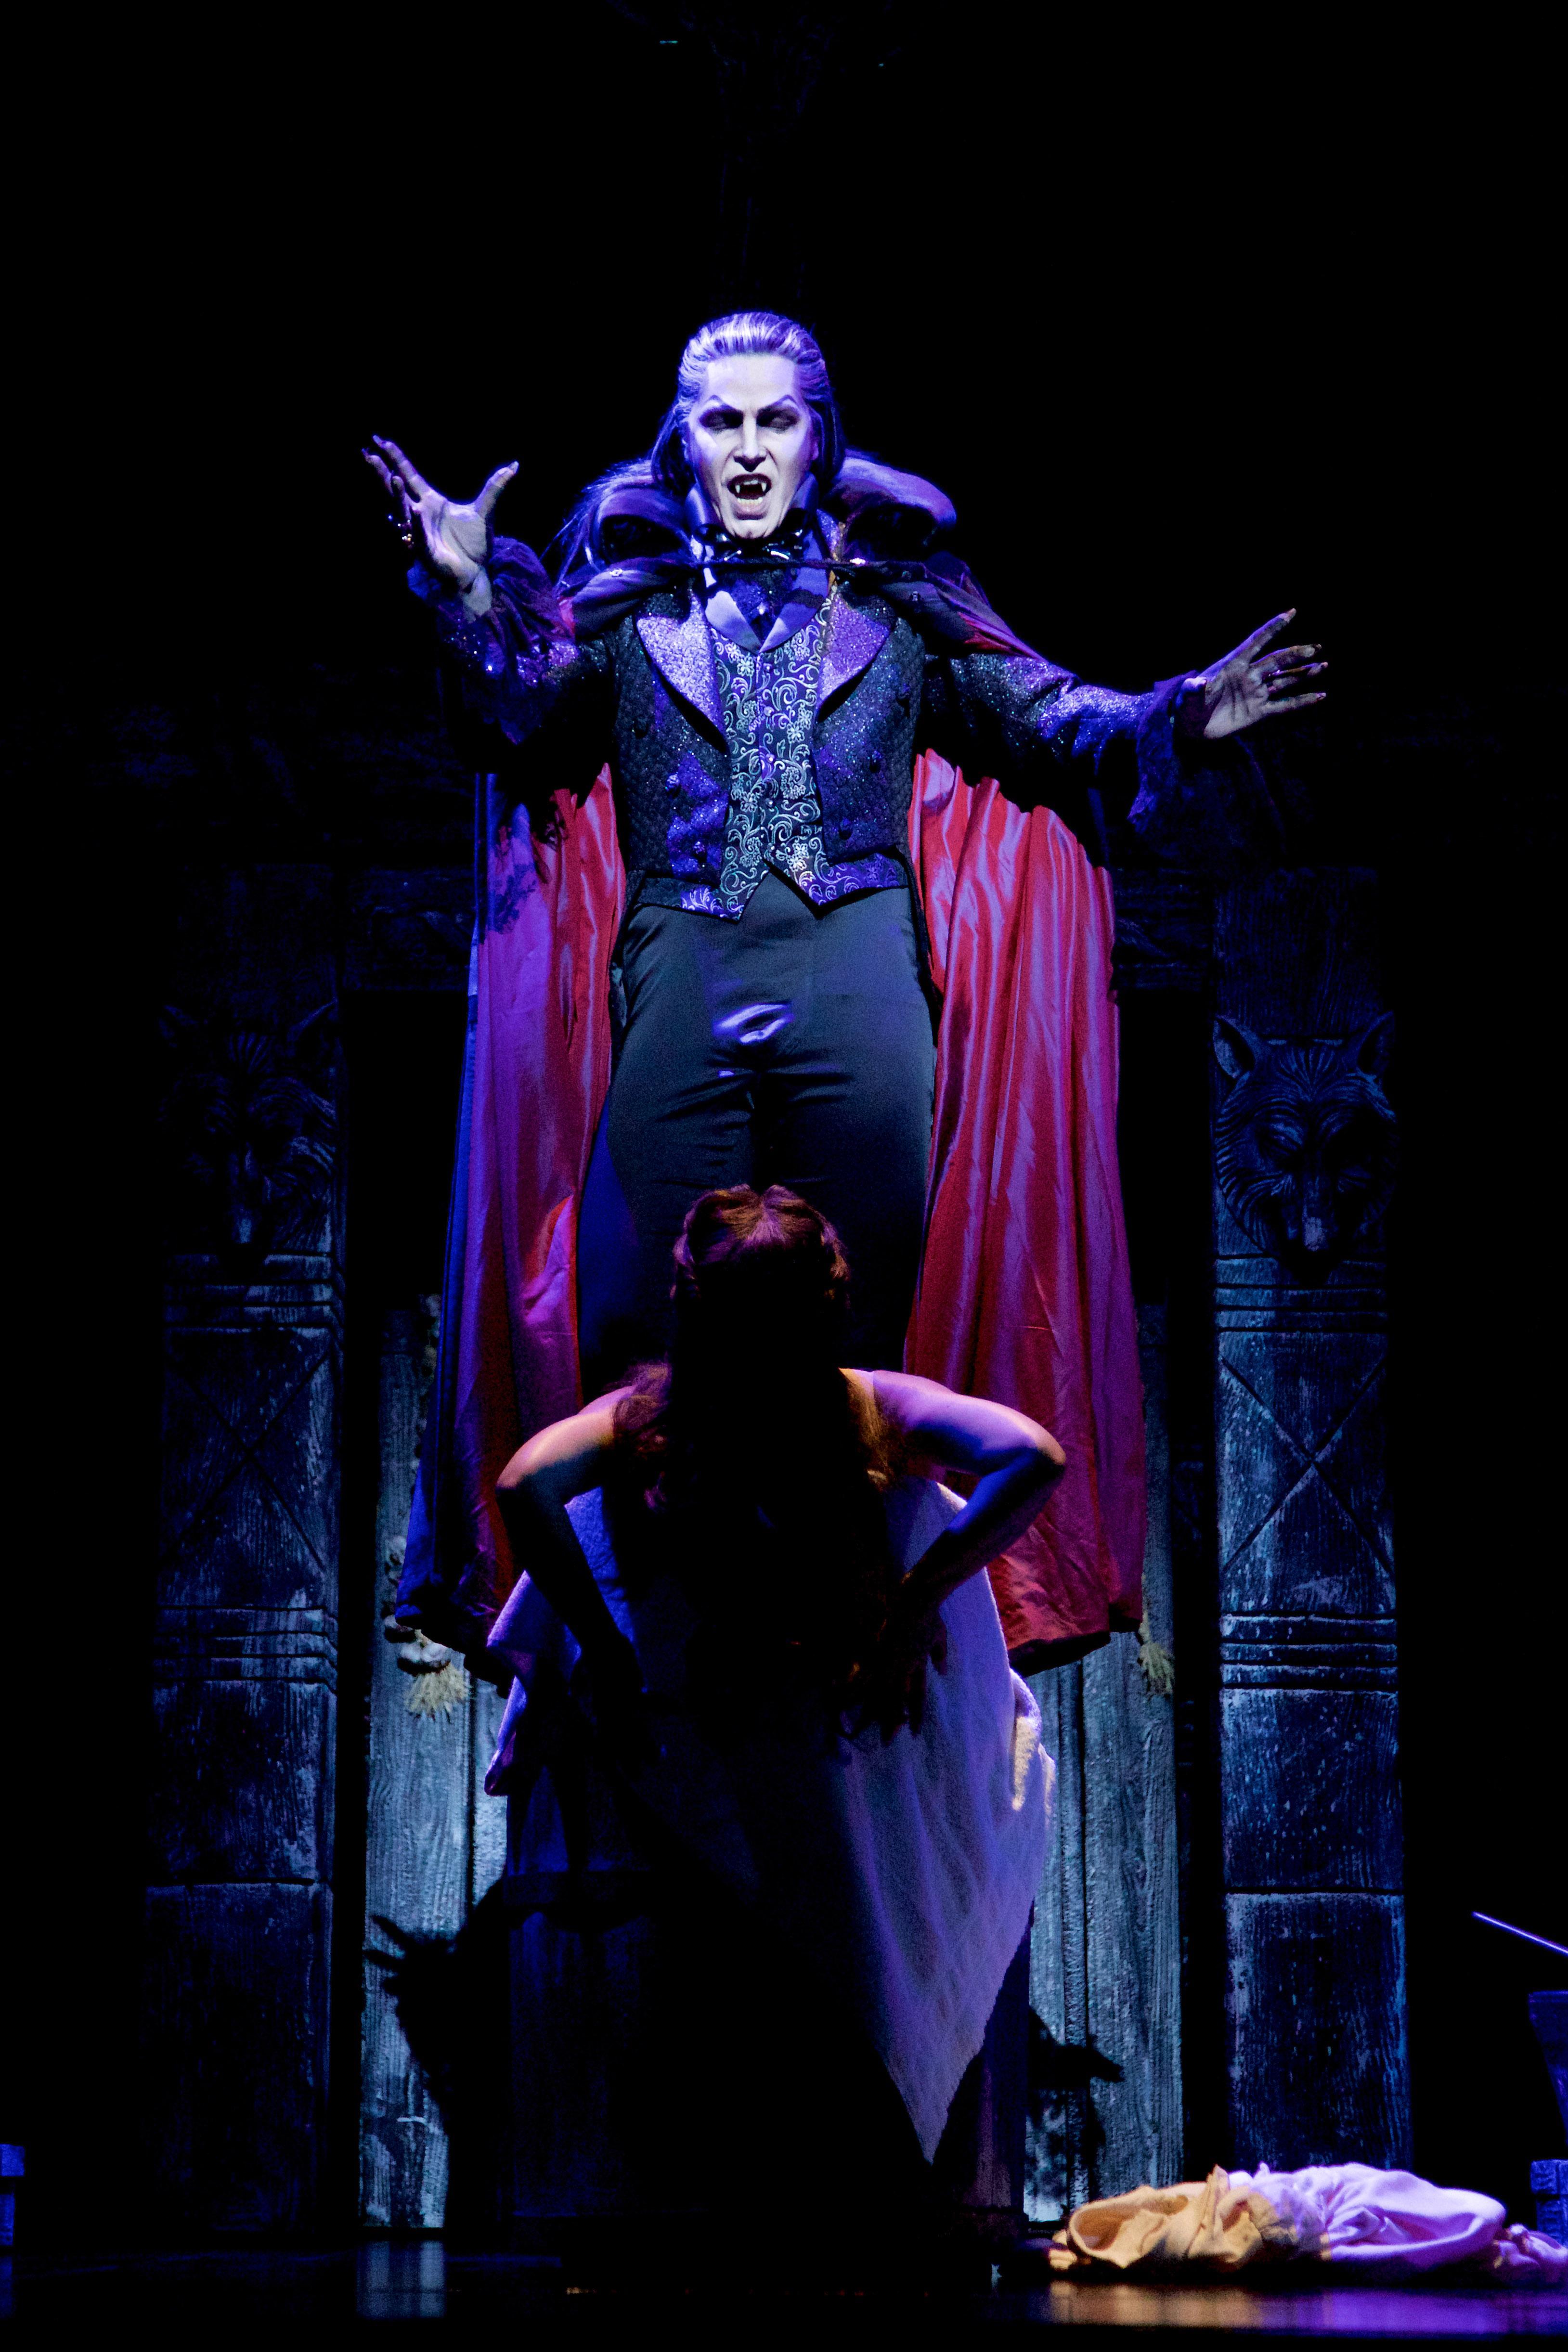 Tanz Der Vampire Besetzung Köln